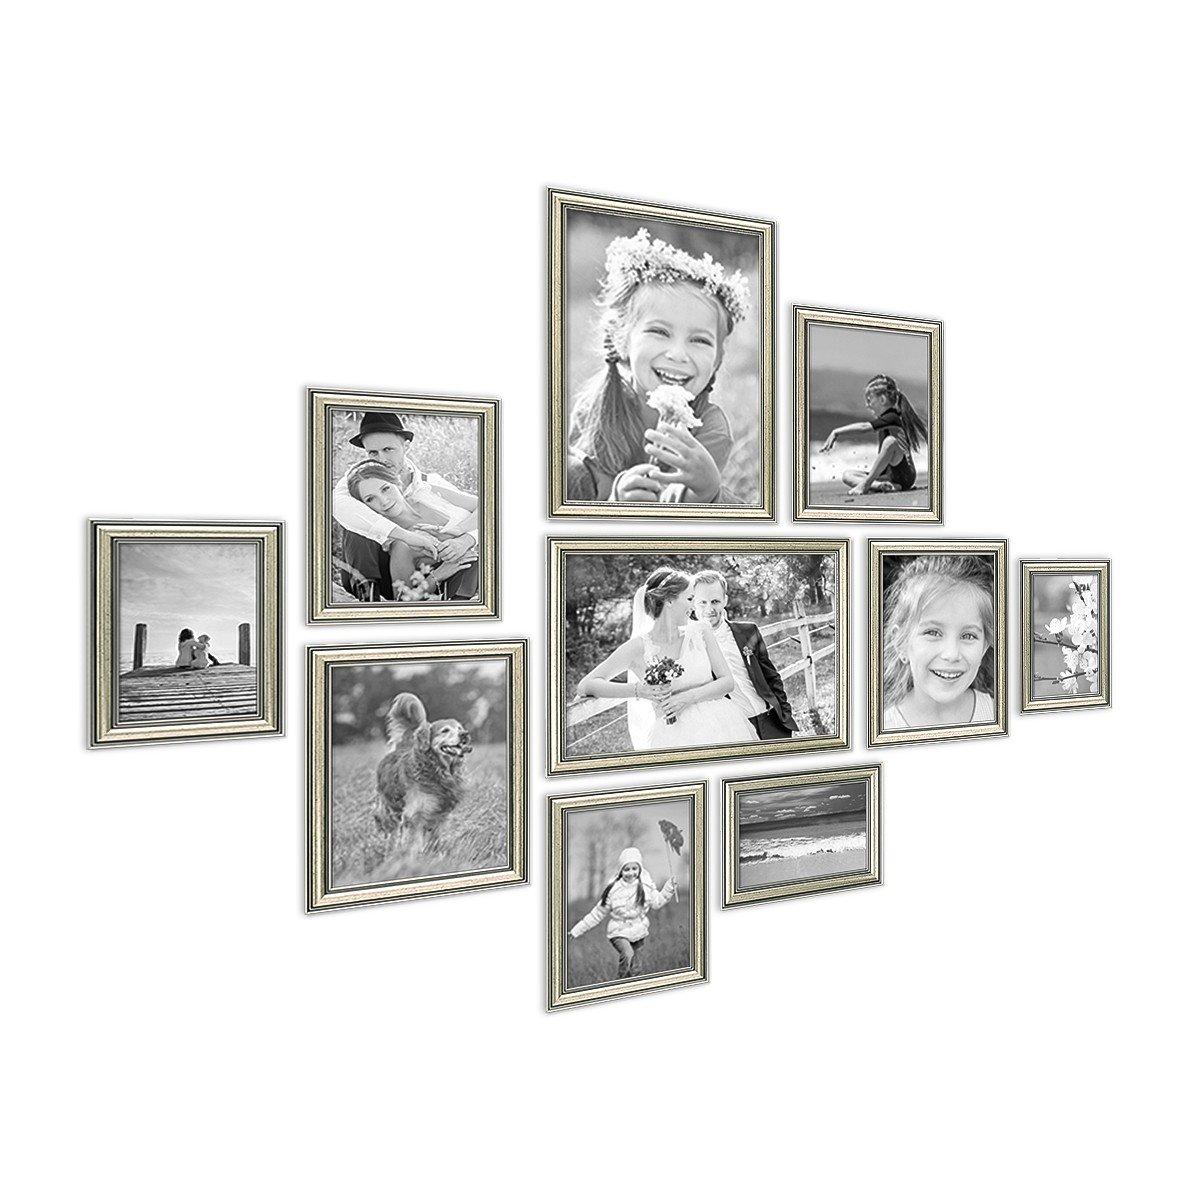 PHOTOLINI 10er Bilderrahmen-Collage Silber Barock Antik aus Kunststoff Inklusive Zubehör Foto-Collage Bildergalerie   Bilderrahmen-Set